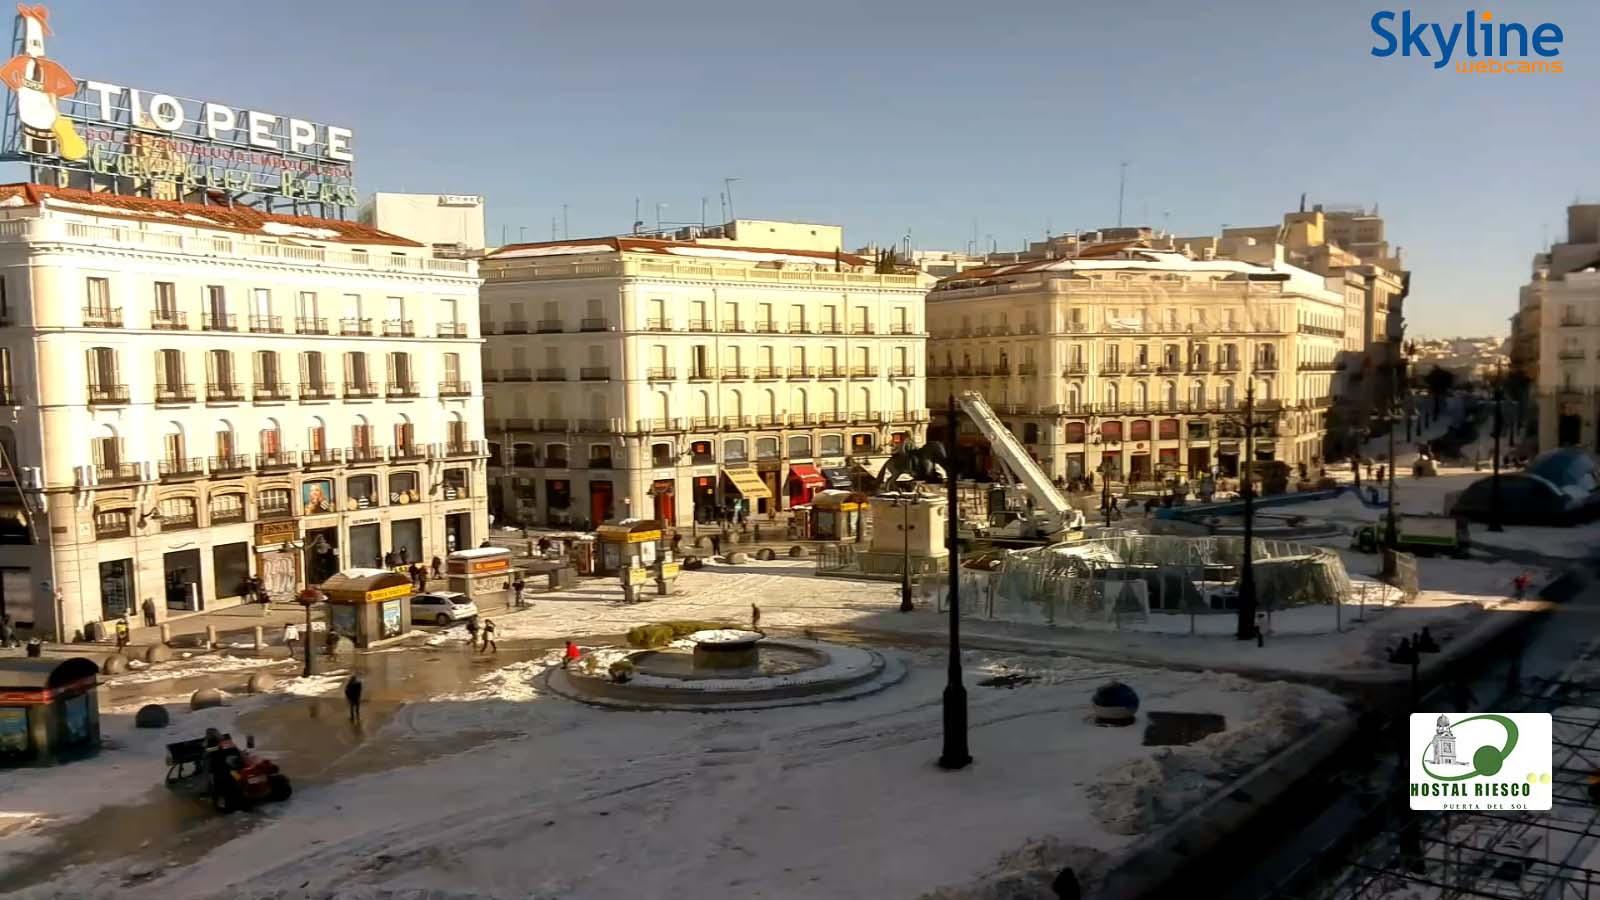 La Puerta del Sol nevada debido a la borrasca Filomena